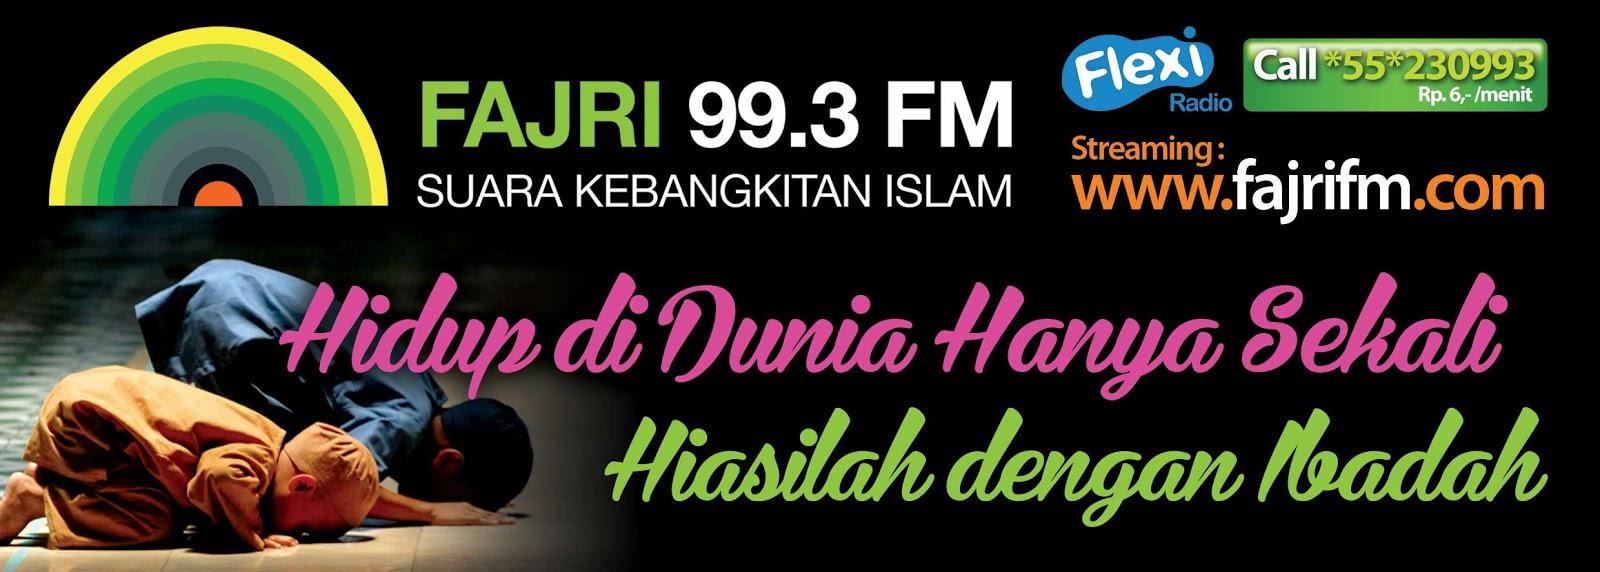 Dakwah Ahlussunnah: FAJRI FM STIKER DAKWAH